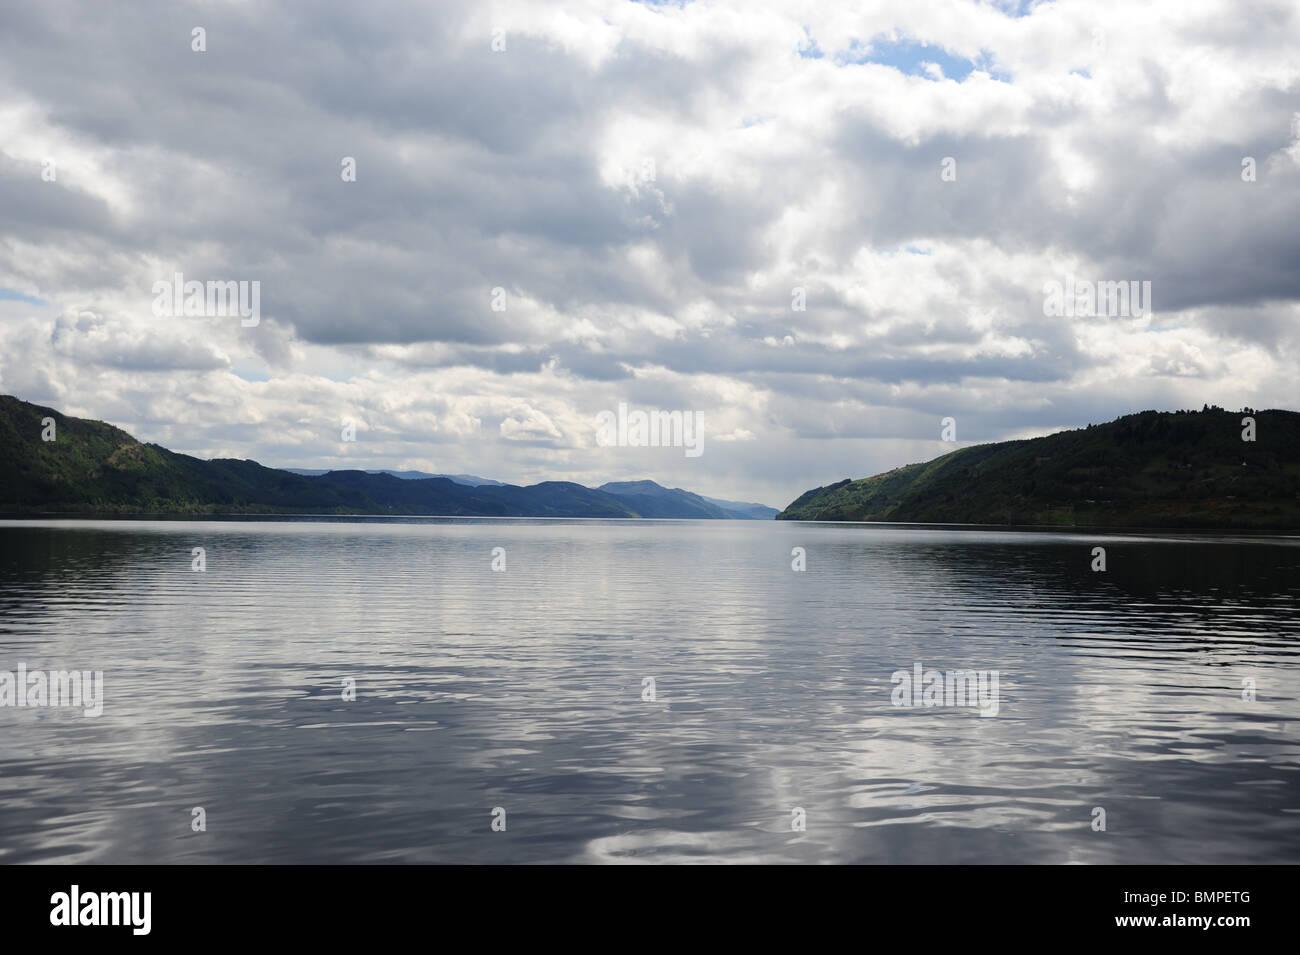 Views of Loch Ness - Stock Image